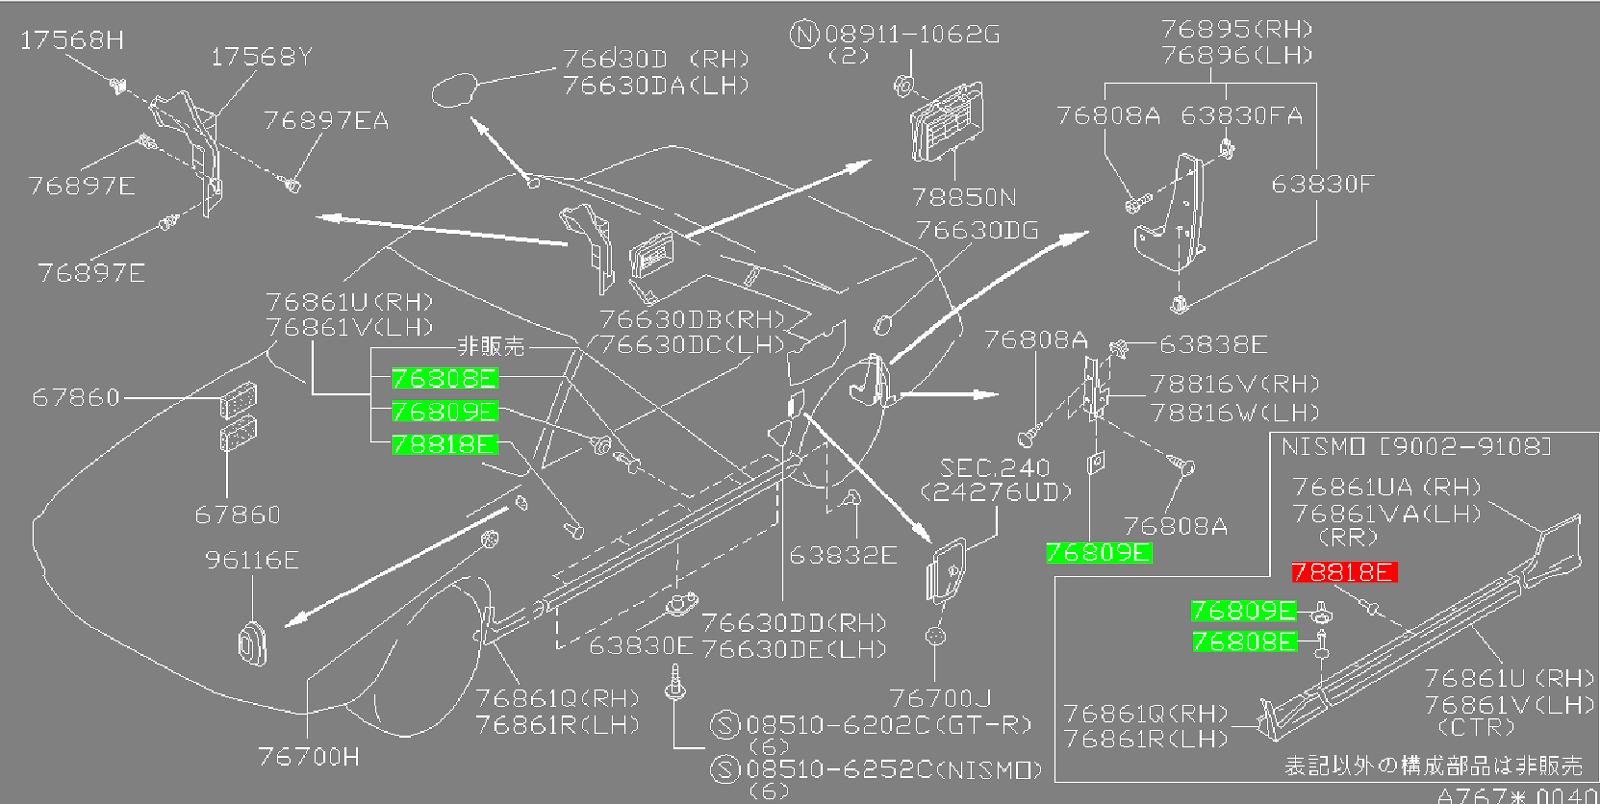 Bnr32 Gt R Sideskirt Clips G 05u00 G 05u00 G